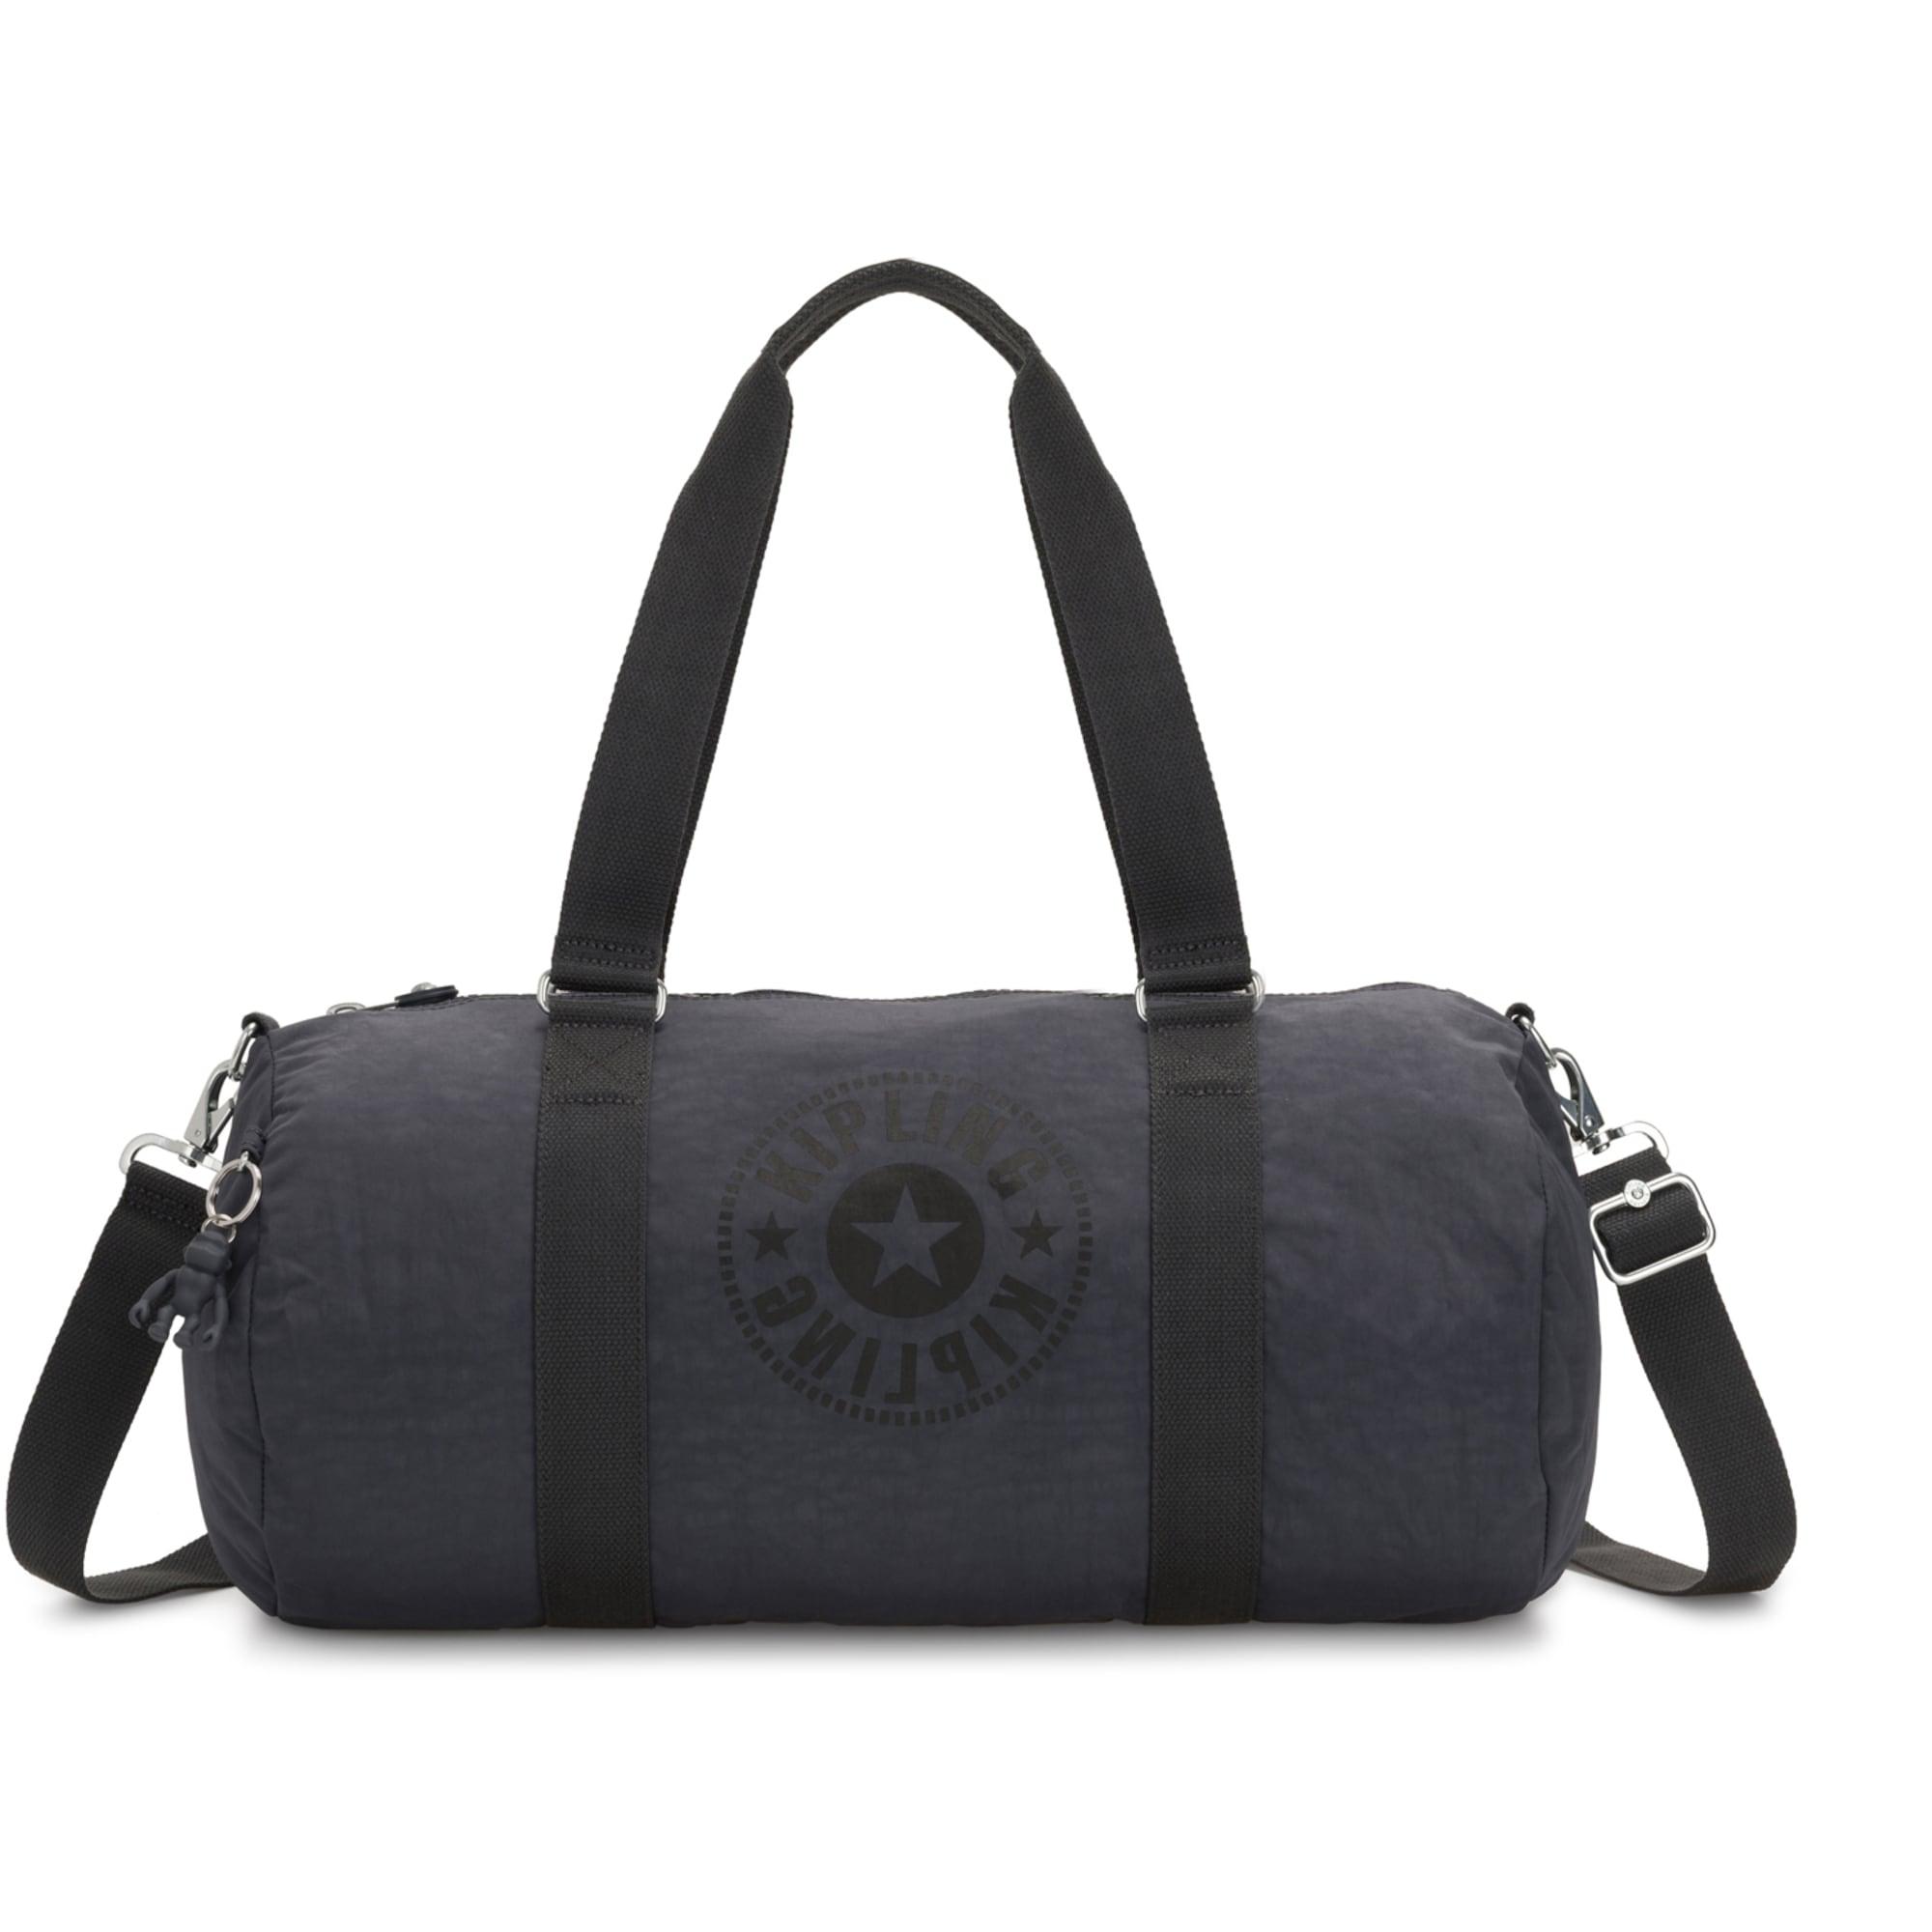 Reisetasche 'New Classics Onalo'   Taschen > Handtaschen   KIPLING